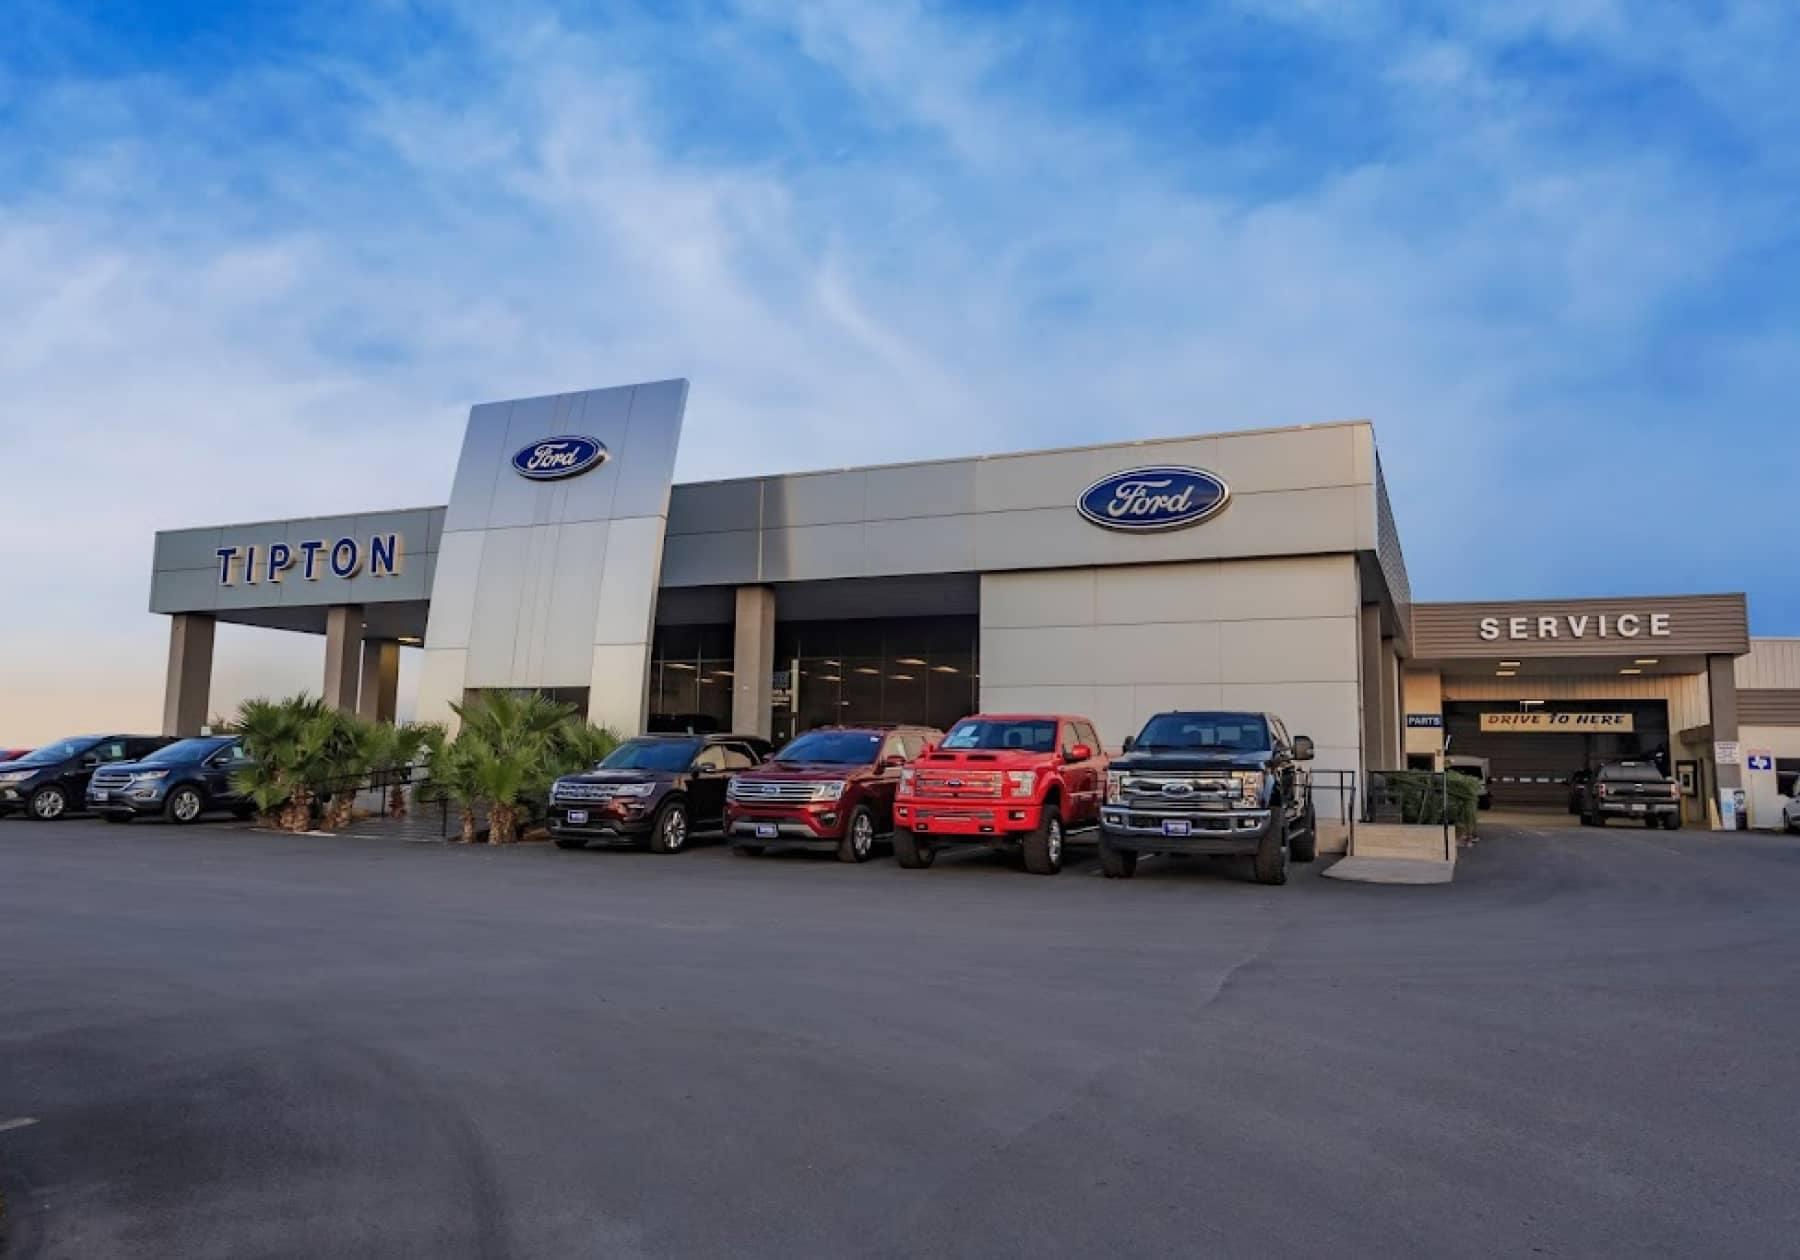 Tipton Ford Brownsville Dealership Outside